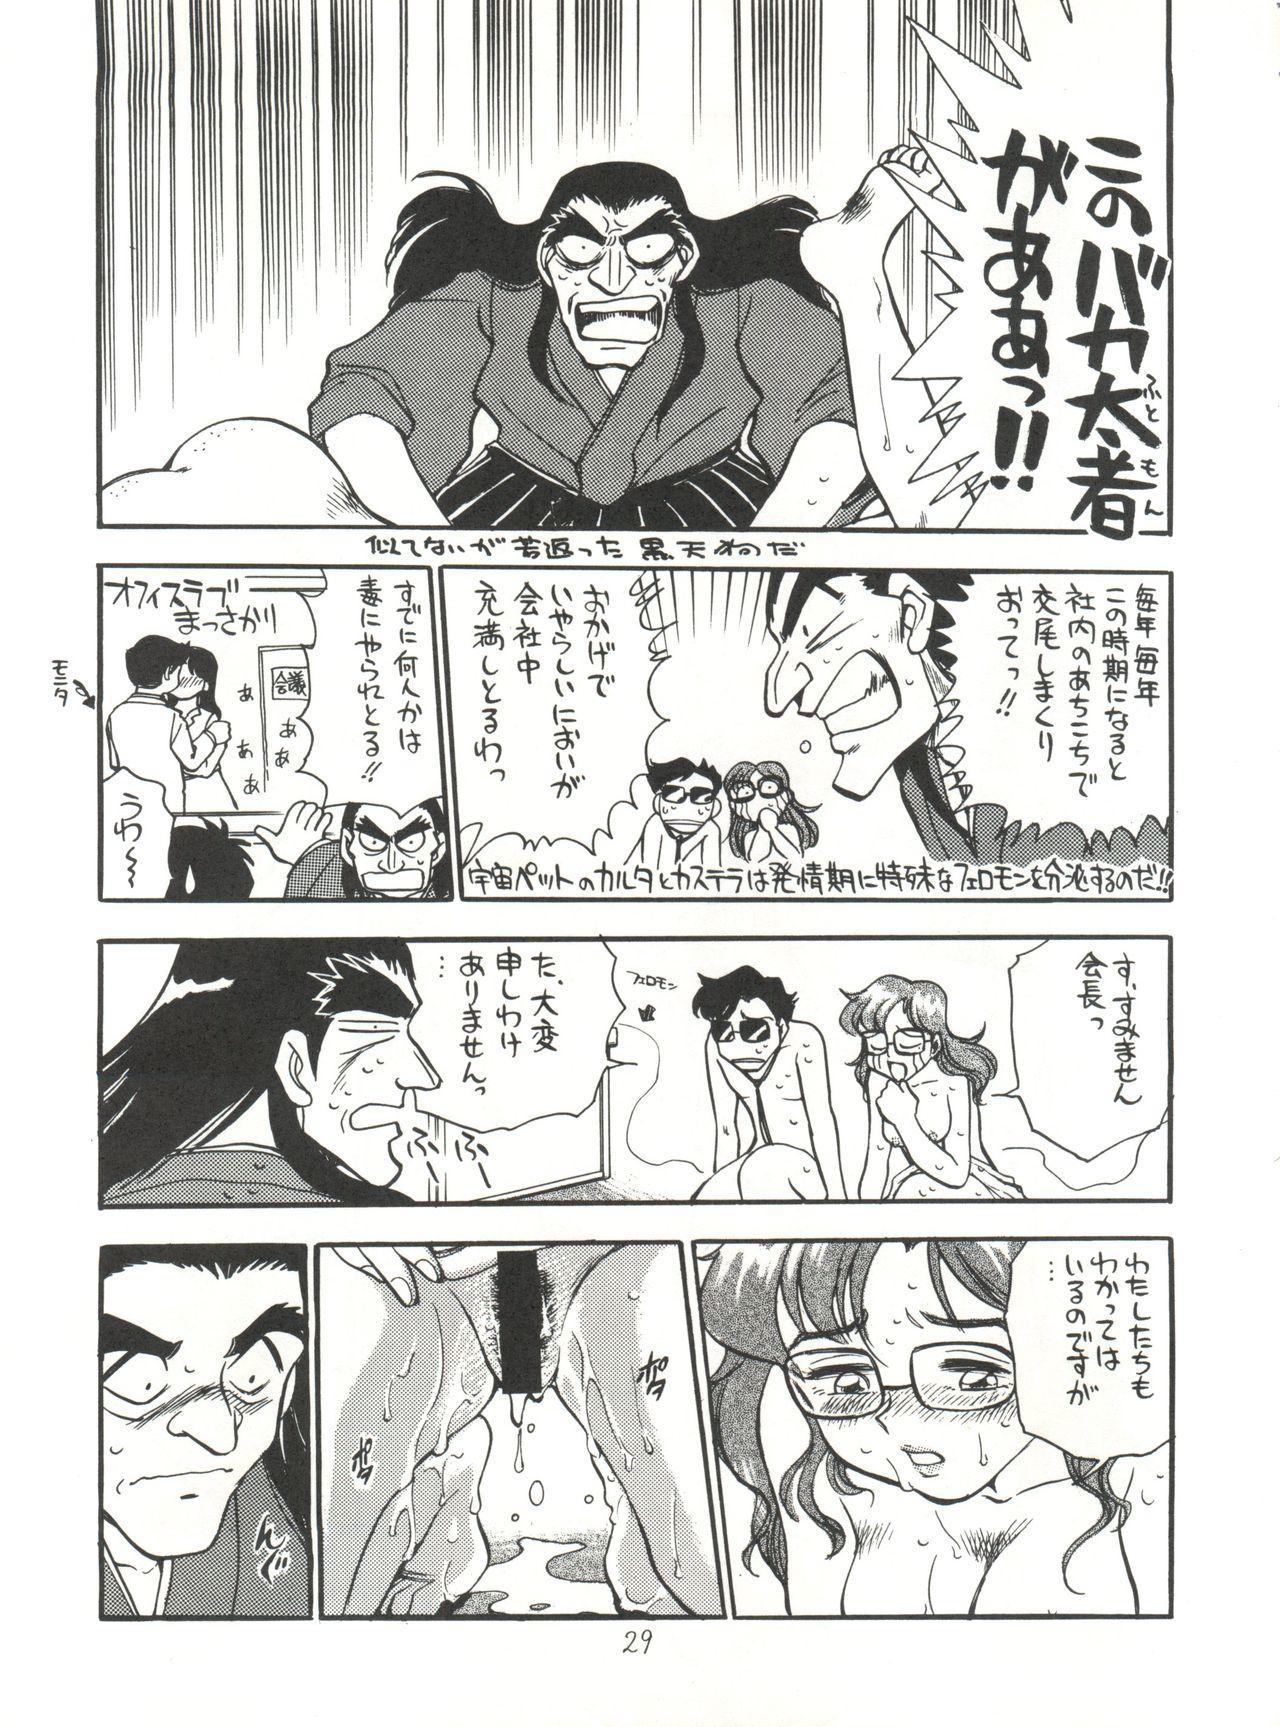 Heart o Migakukkya Nai 28